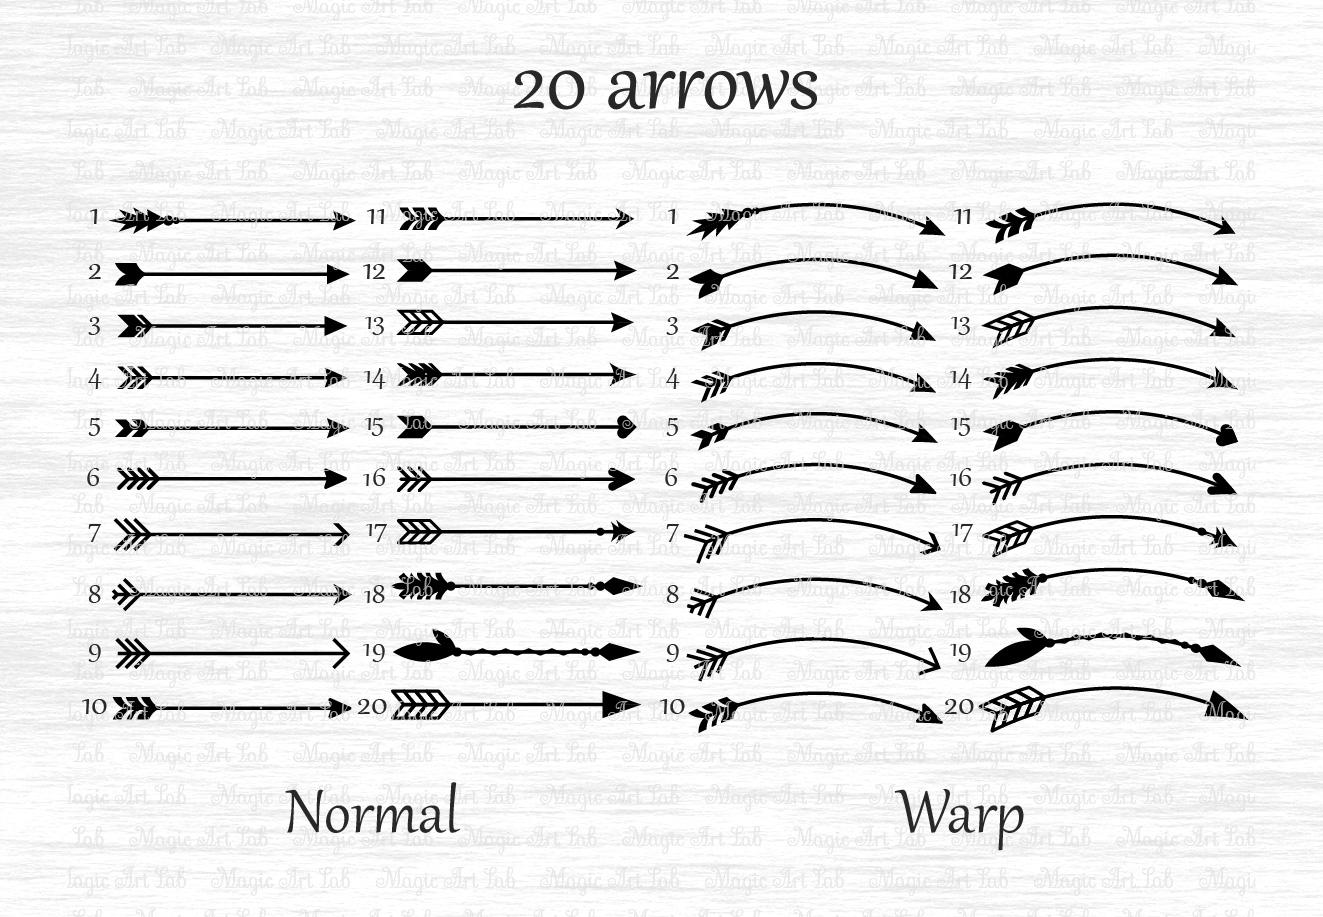 Arrows svg, Circle monogram svg, Circle frame arrow, Heart frame, Criss cross arrows, Tribal arrows svg, Boho arrows clipart, Ethnic aztec example image 4